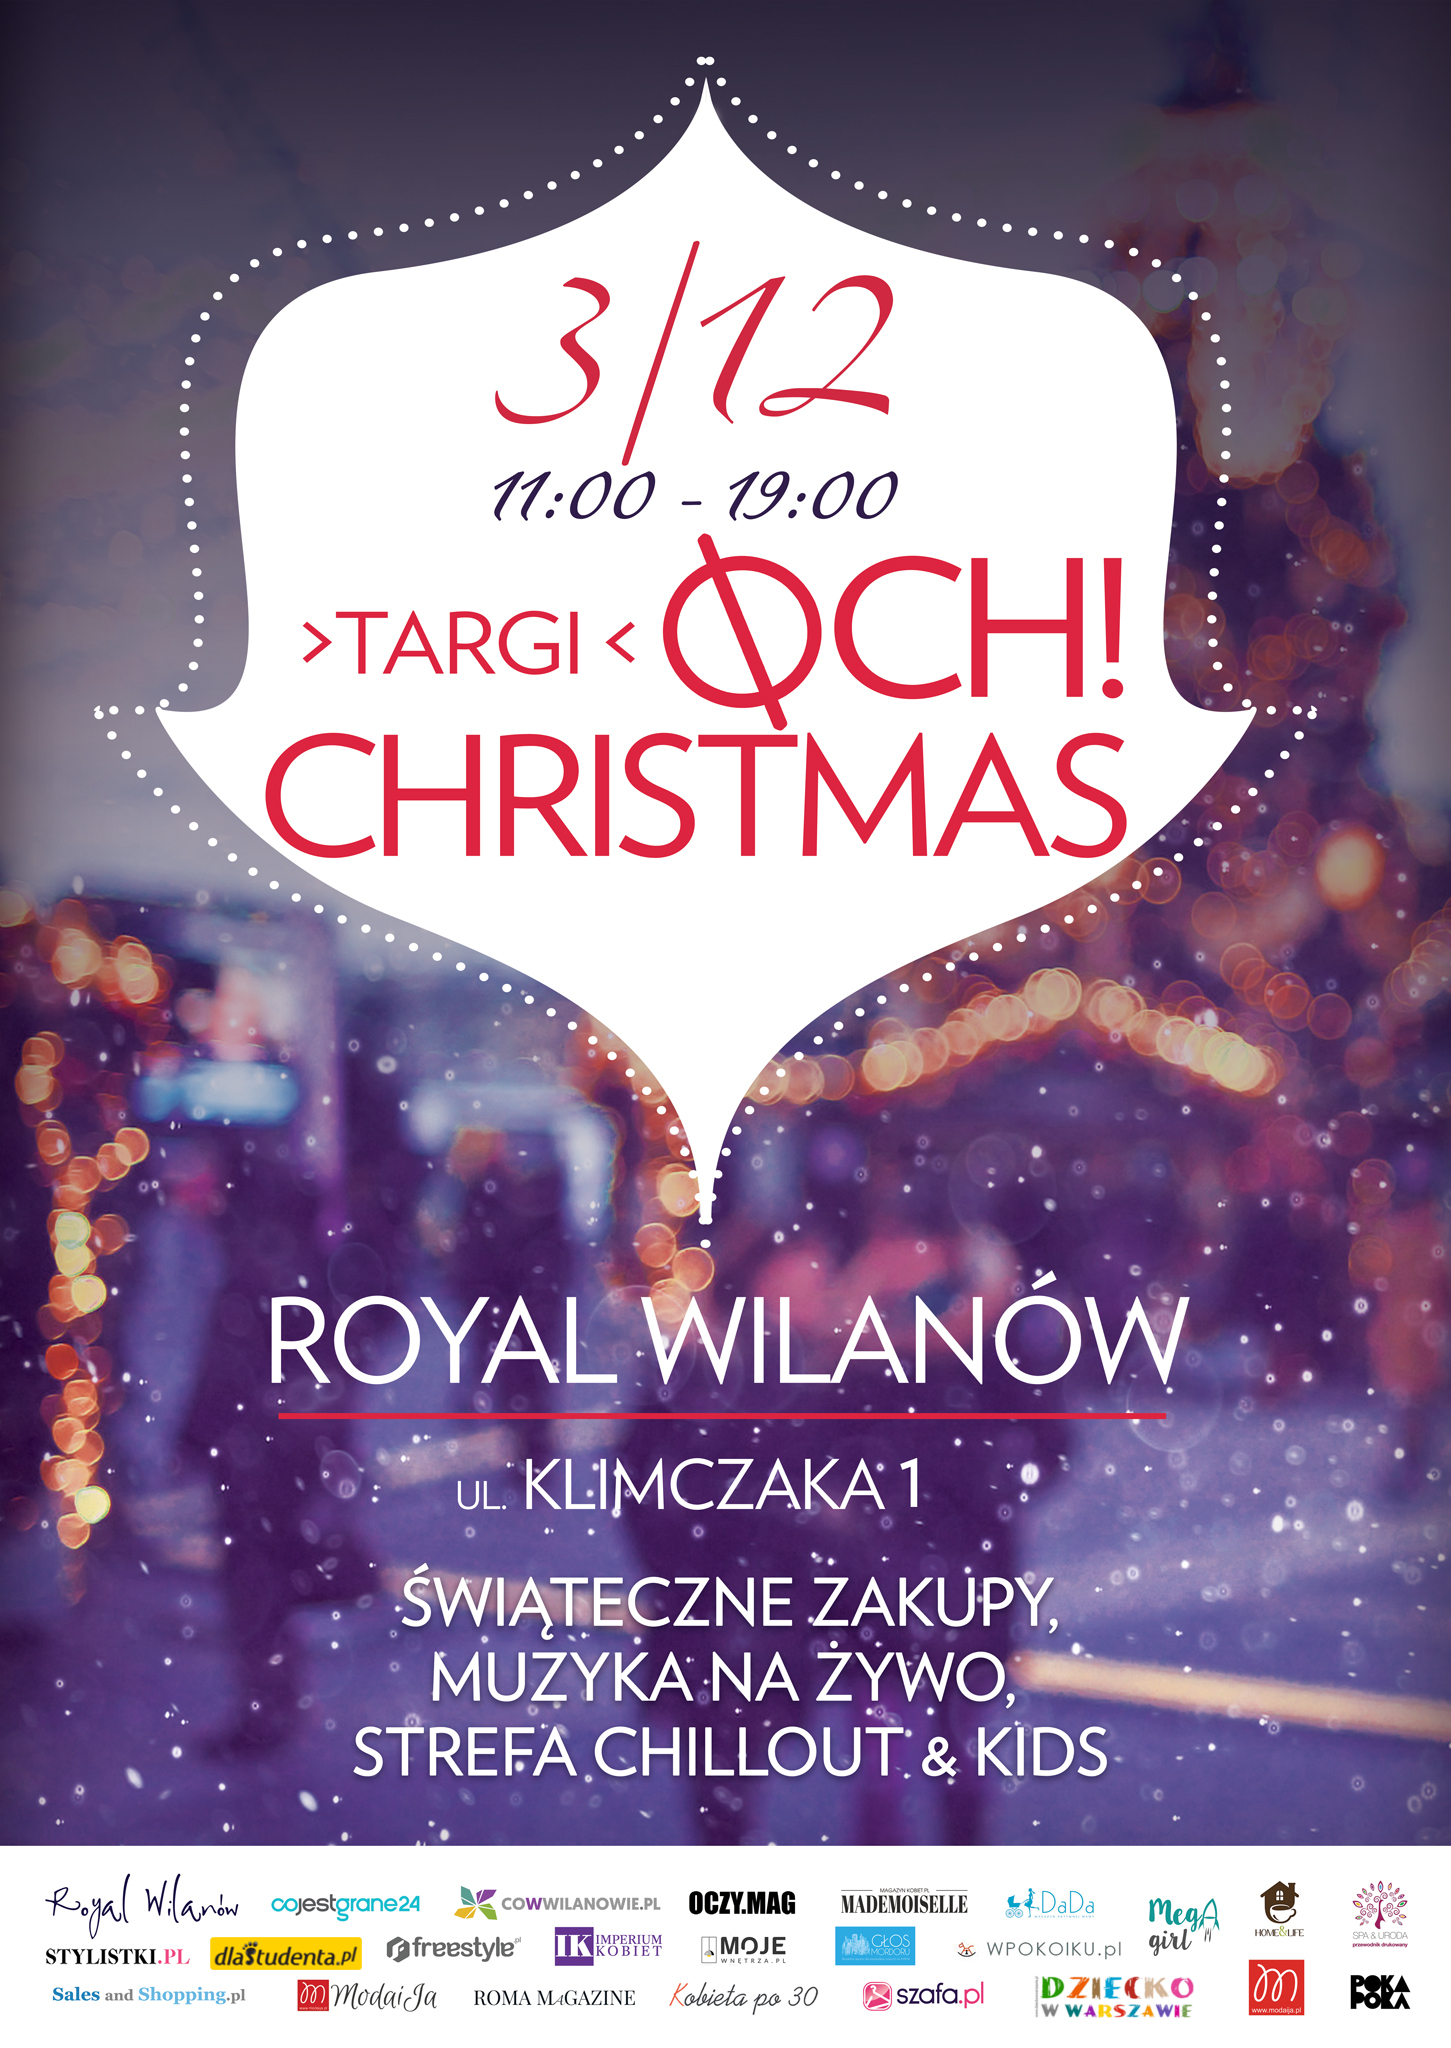 OCH! CHRISTMAS targi w Royal Wilanów już 3 grudnia